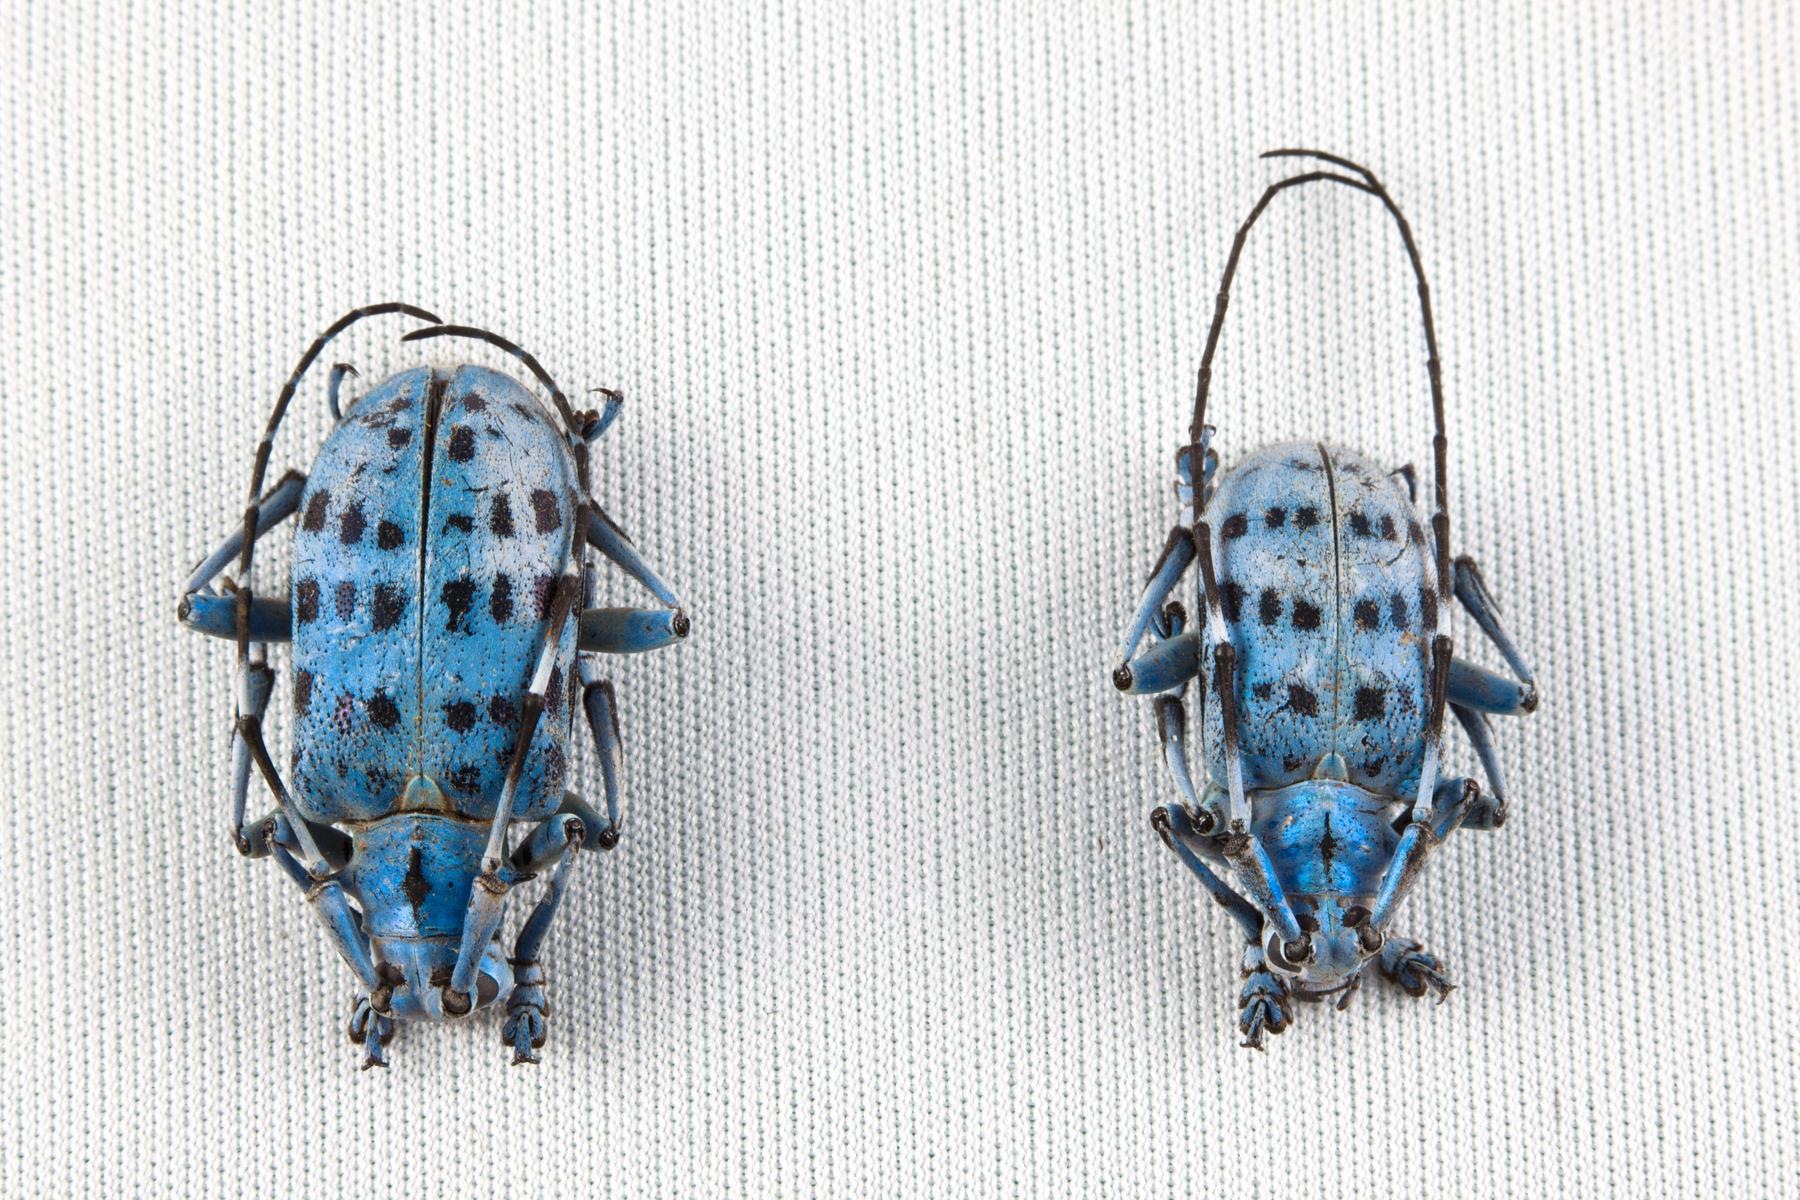 Pseudomyagrus Waterhousei Beetles